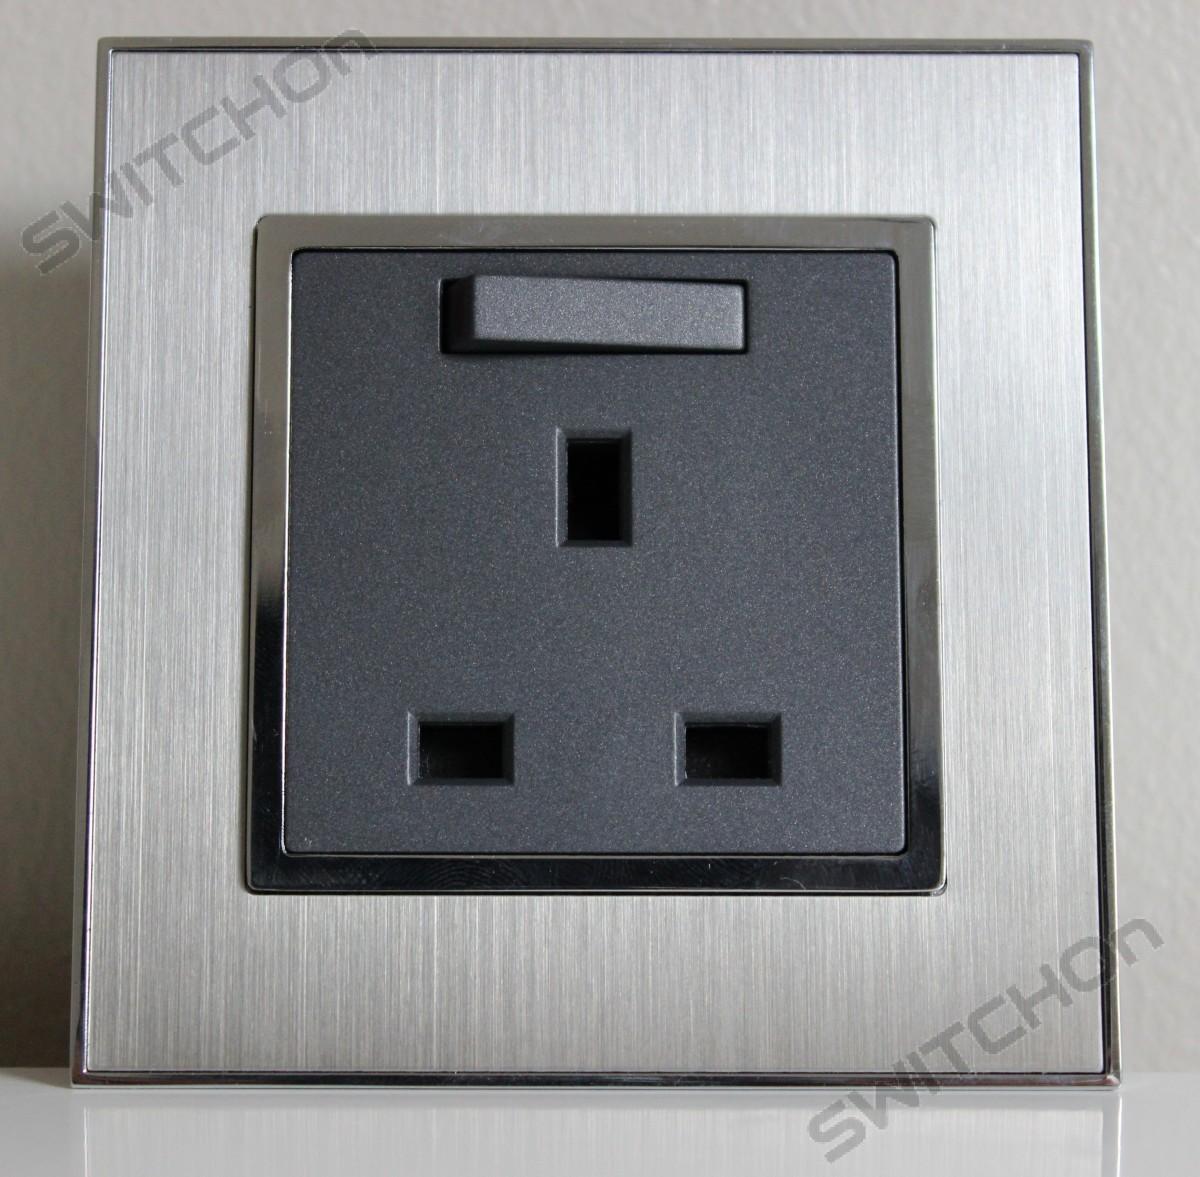 Brushed Satin Silver 13 Amp Single Switched Plug Socket